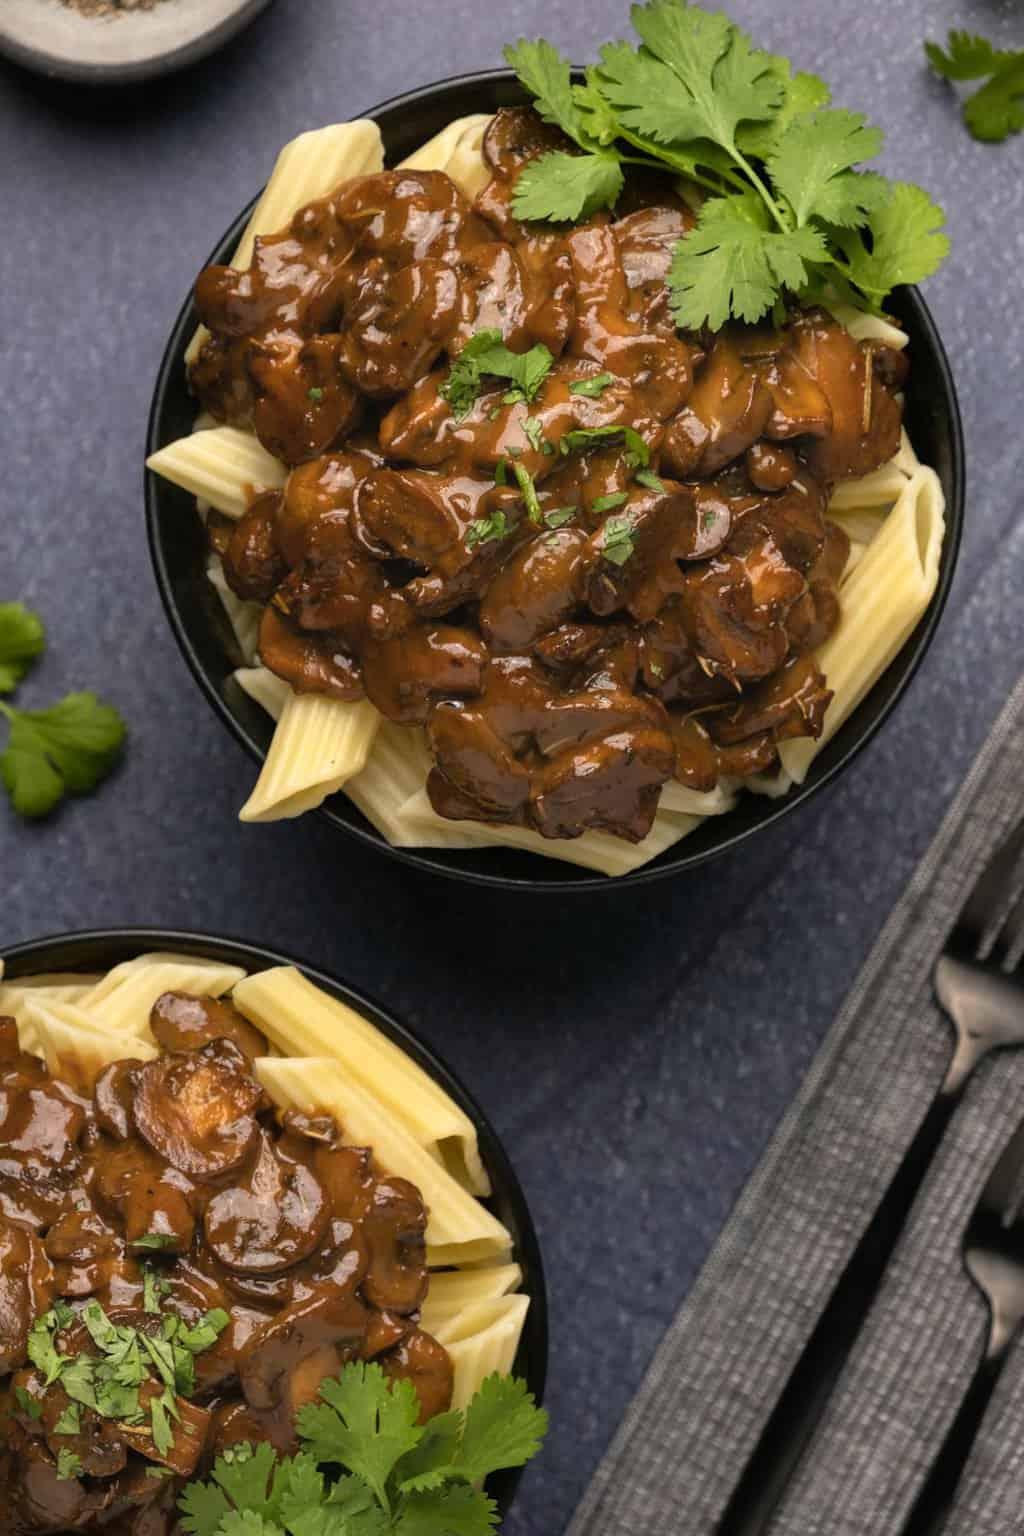 Dairy free mushroom sauce over penne in black bowls.